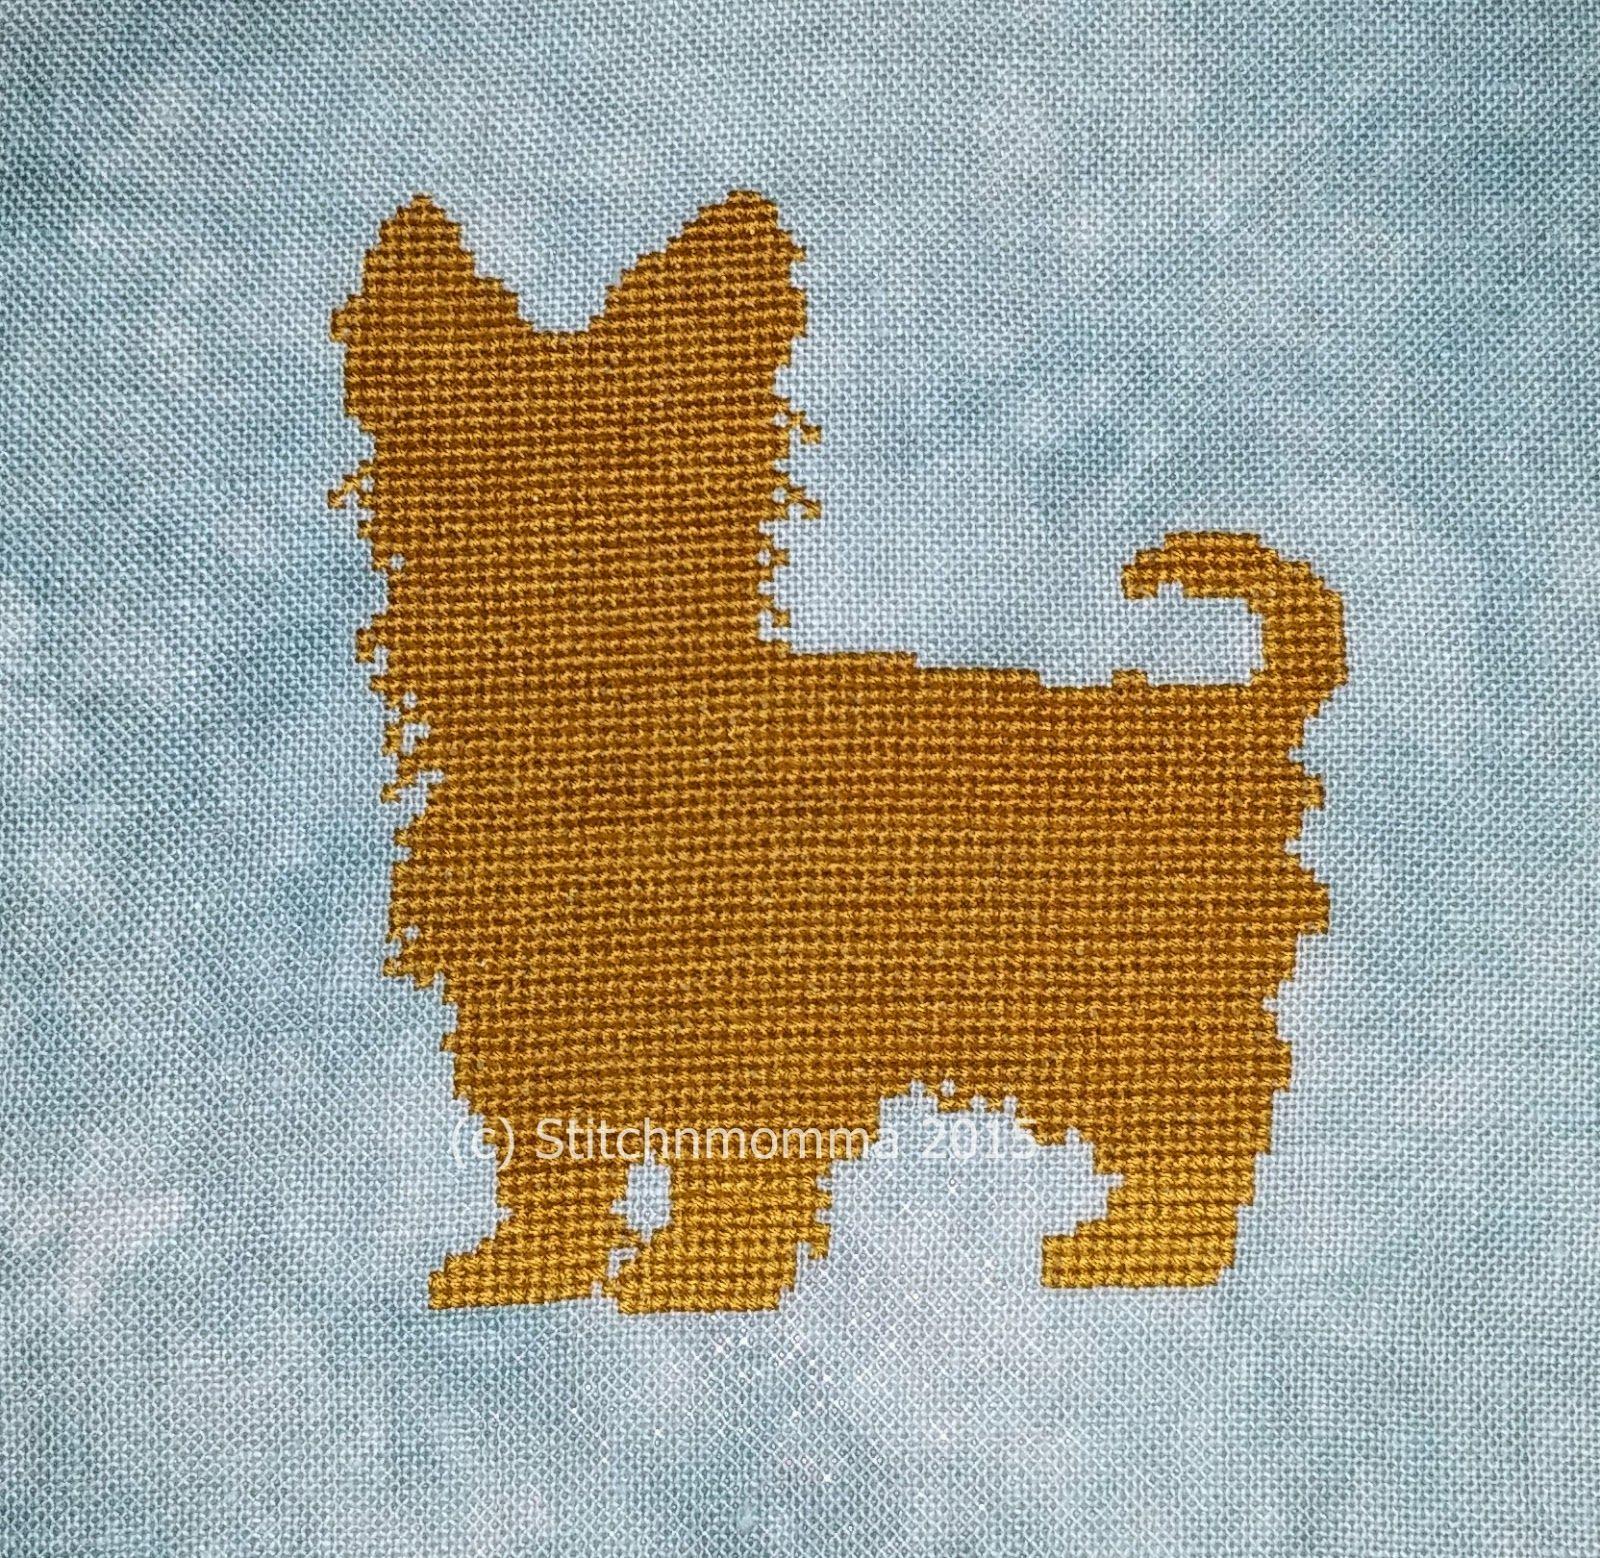 Yorkshire Terrier (Yorkie) Silhouette Cross Stitch